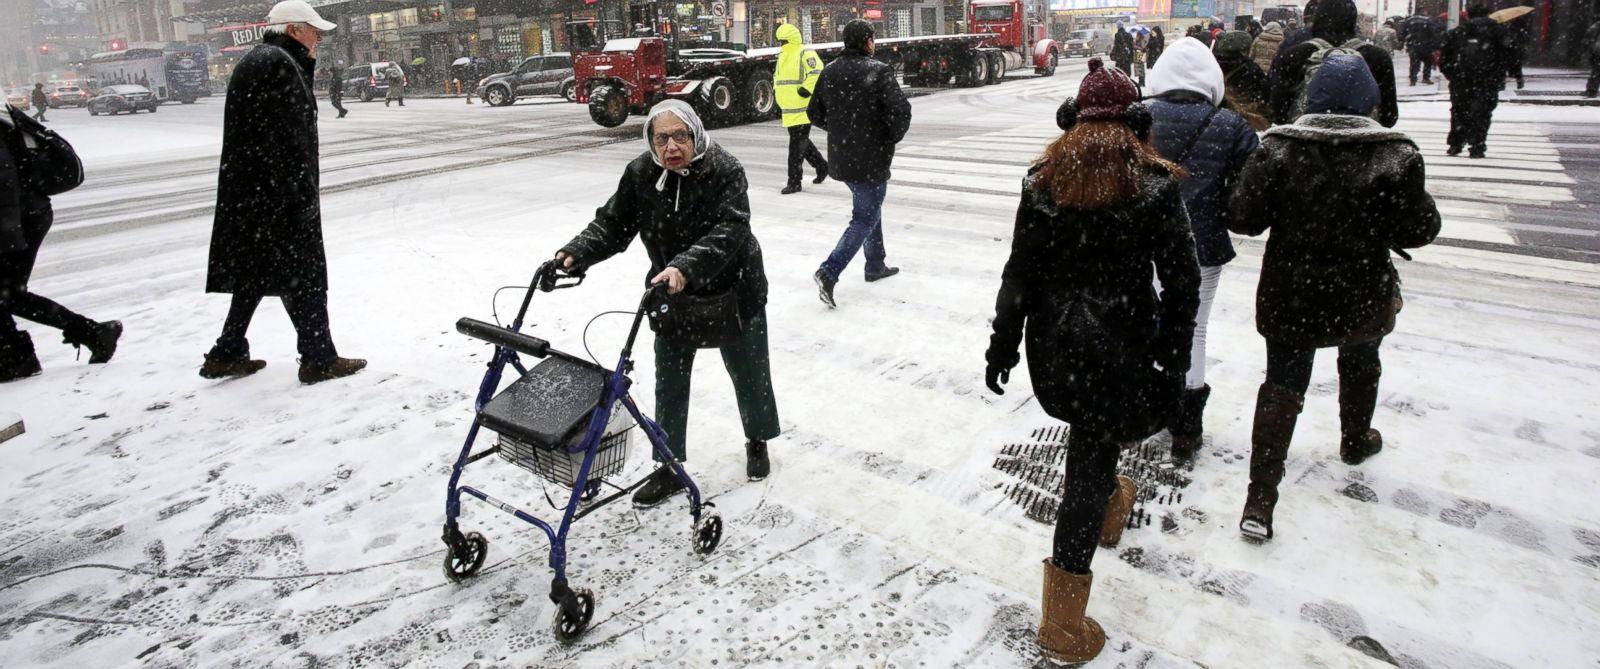 PHOTO: Pedestrians make their way through a snowfall, Jan. 21, 2014 in New Yorks Times Square.